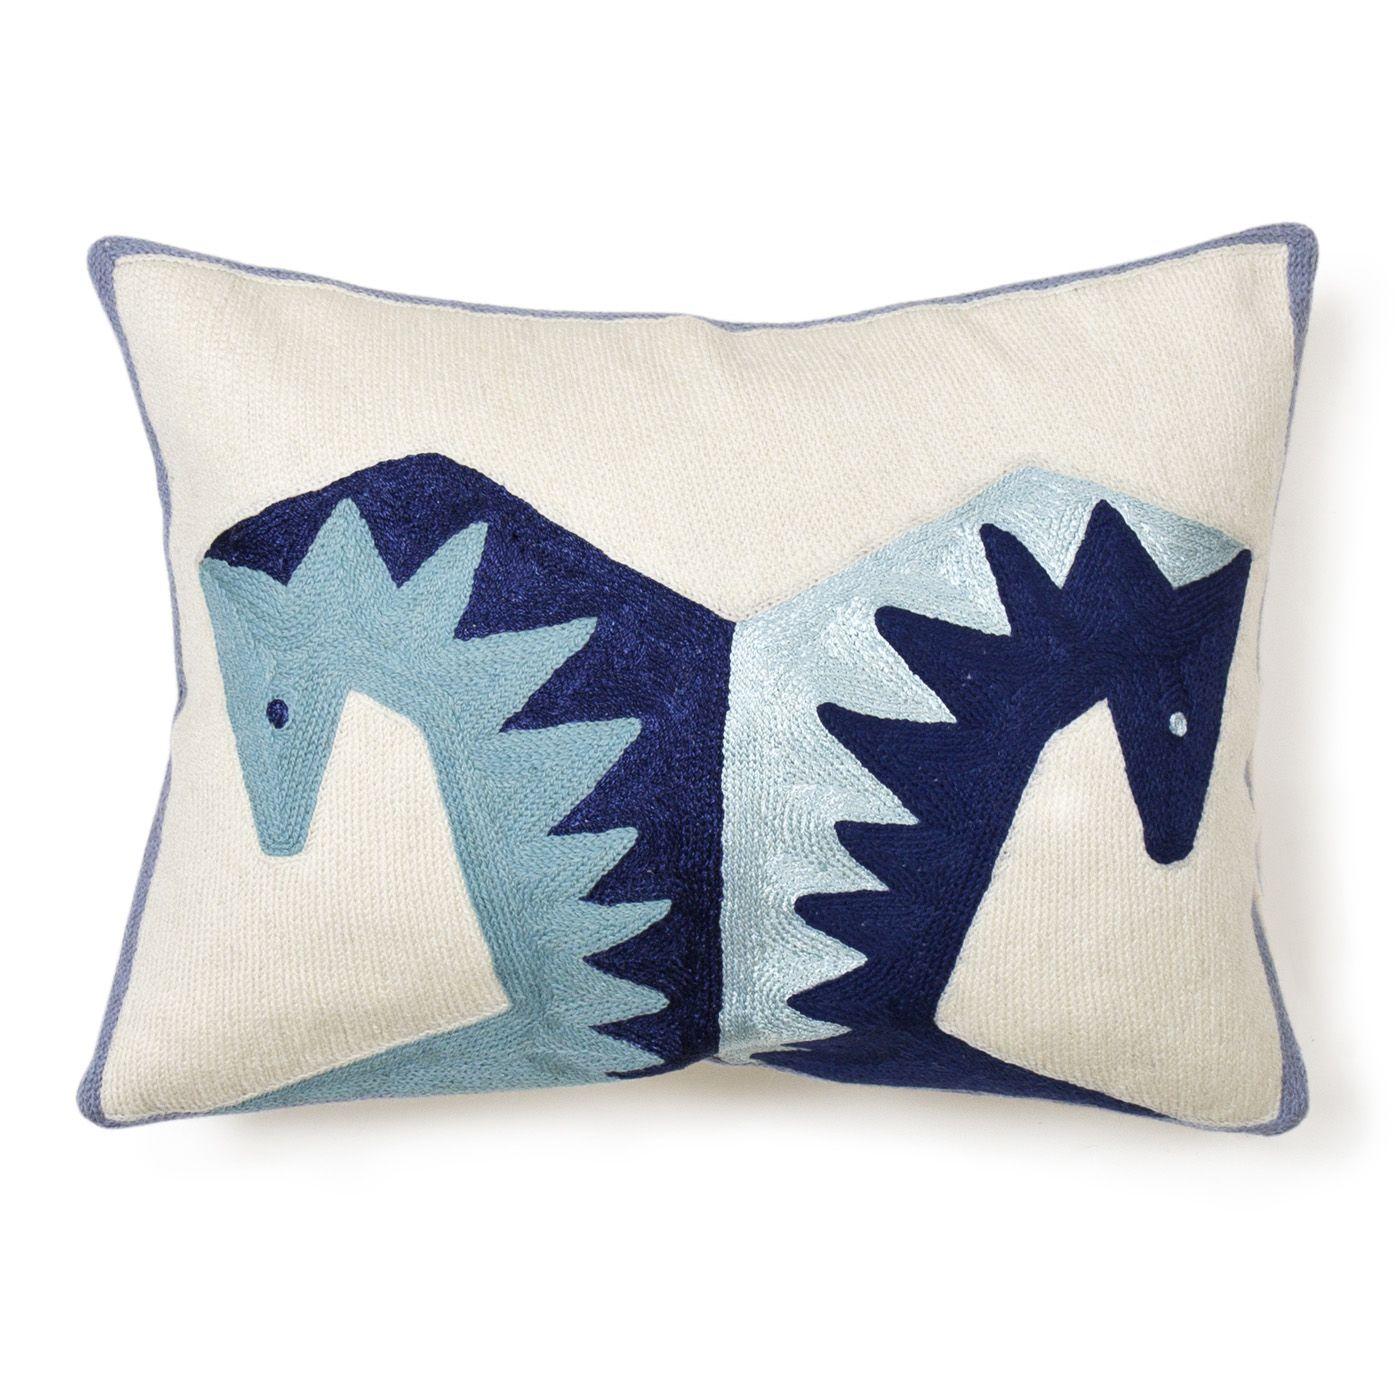 Modern throw pillows brasilia horse wool throw pillow jonathan